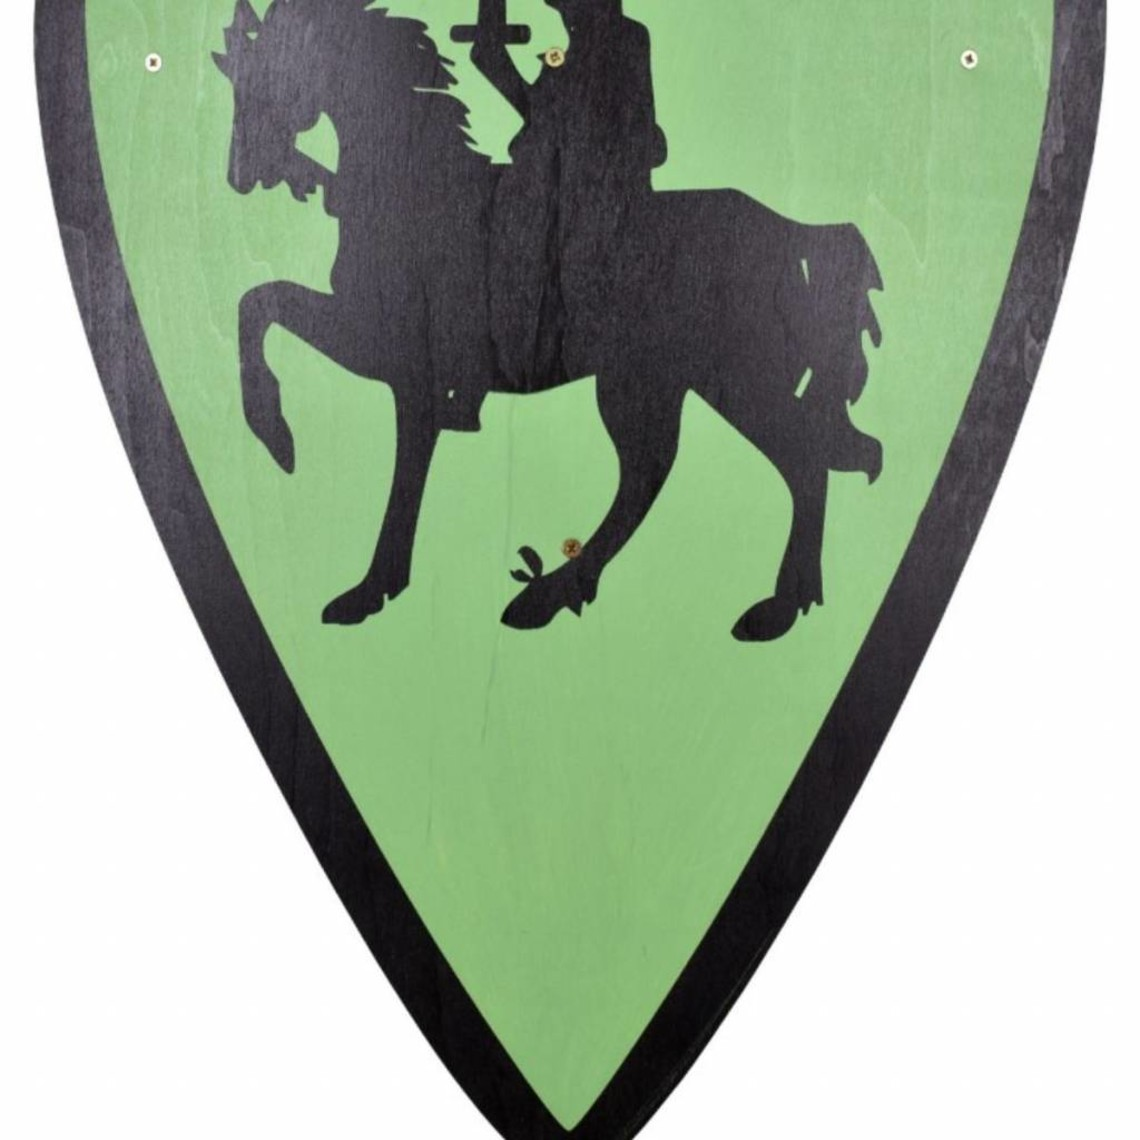 Chevalier bouclier jouet, vert